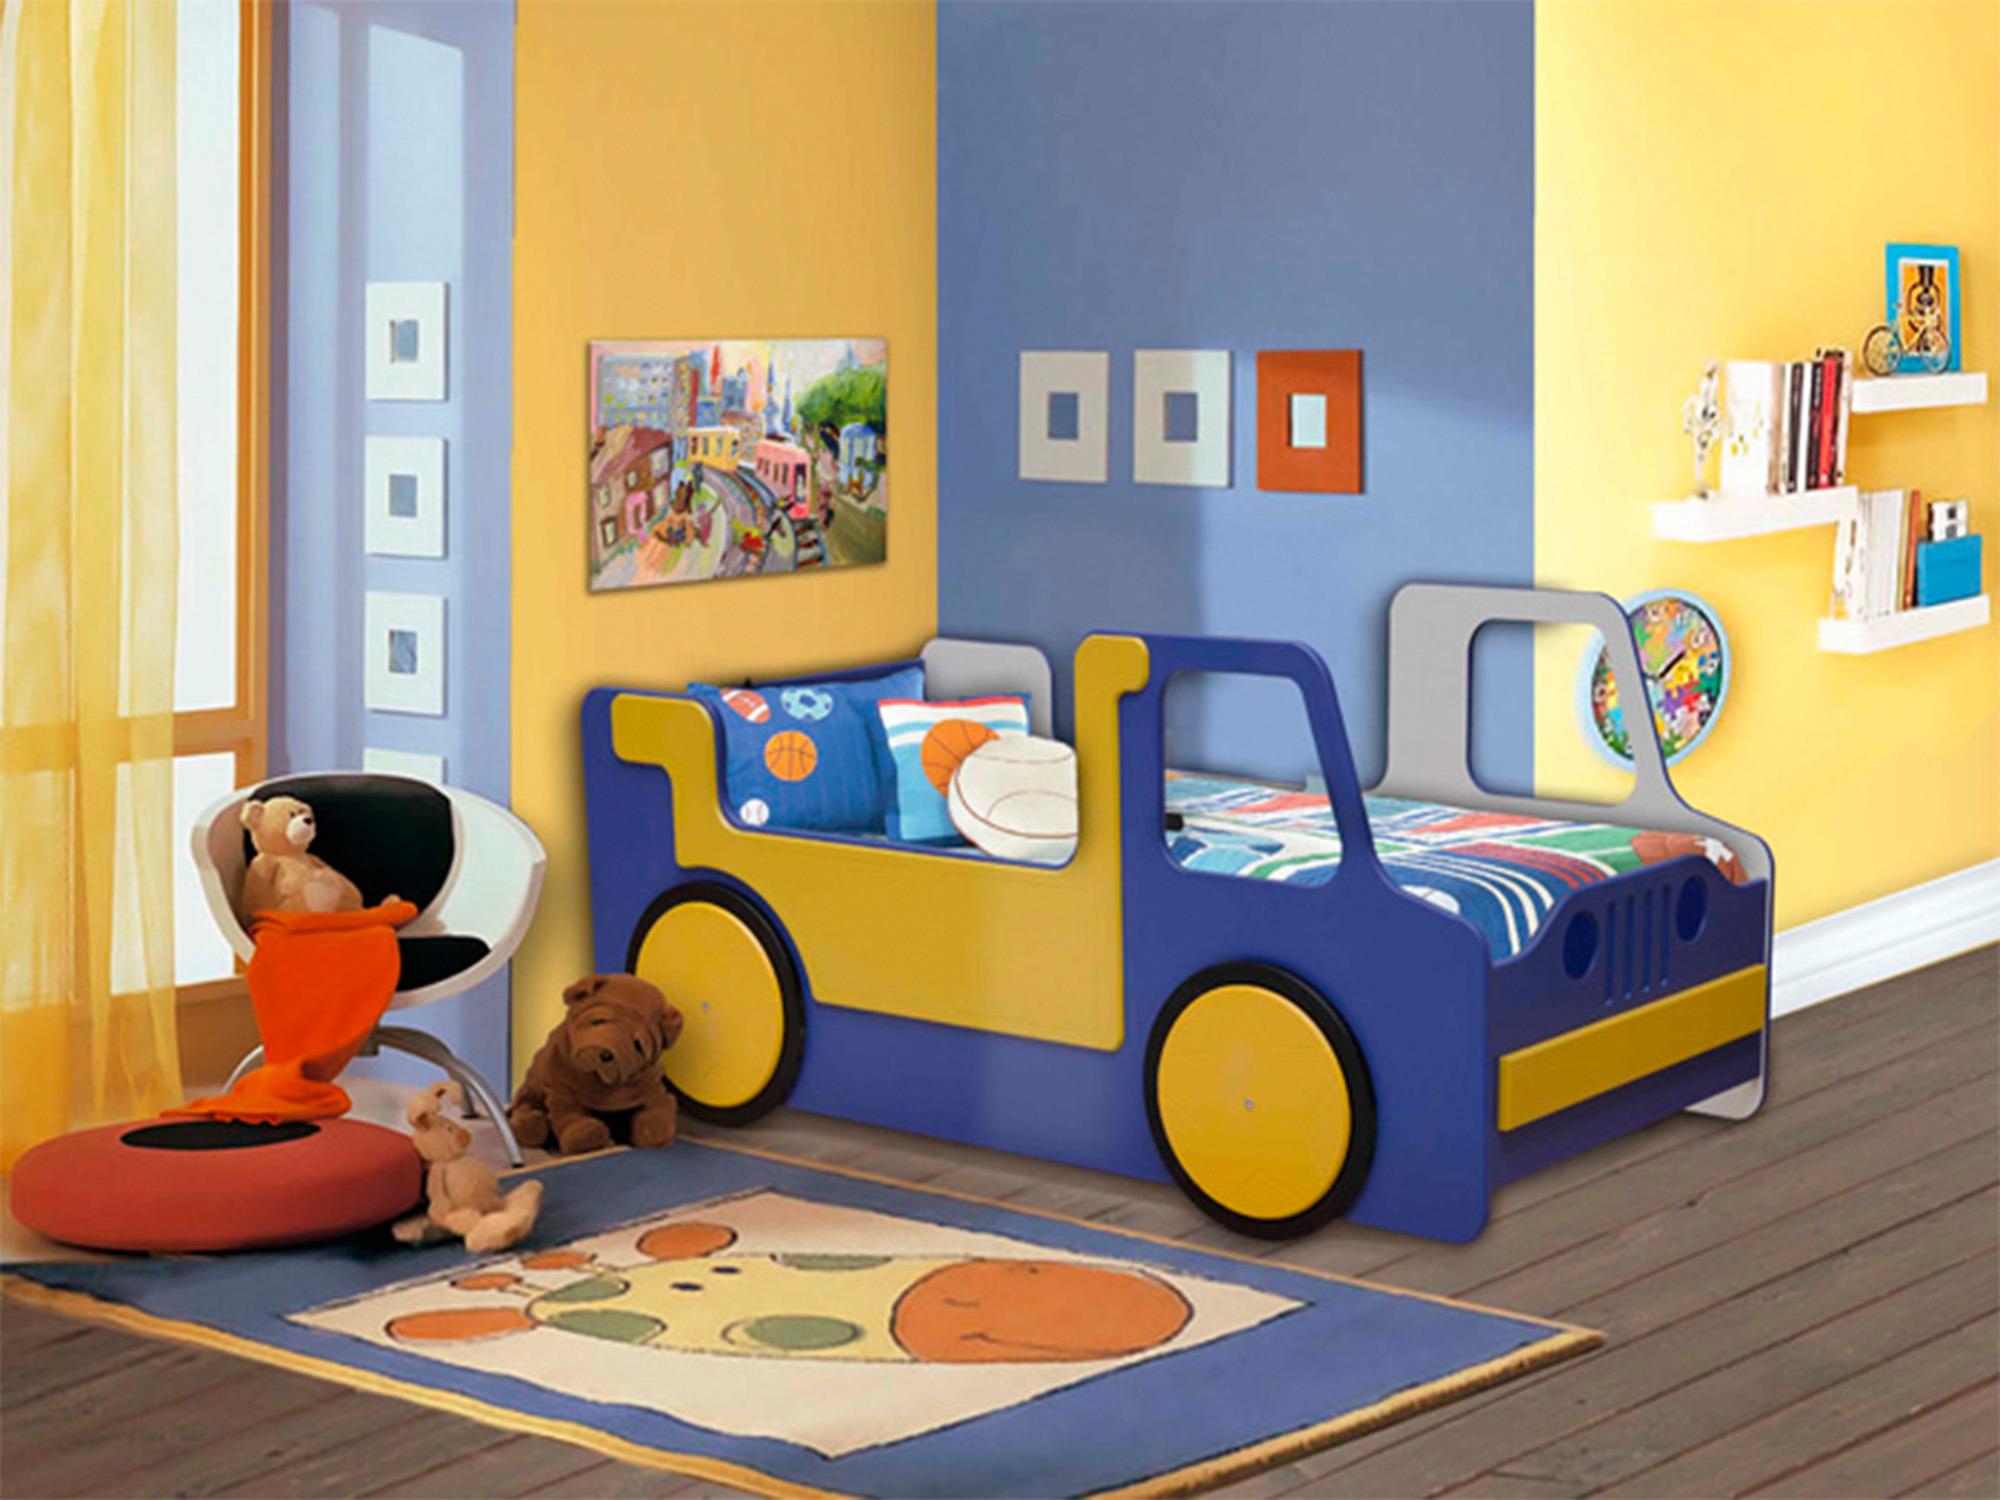 Кровать ГрузовикДетские кровати<br><br><br>Длина мм: 840<br>Высота мм: 805<br>Глубина мм: 1755